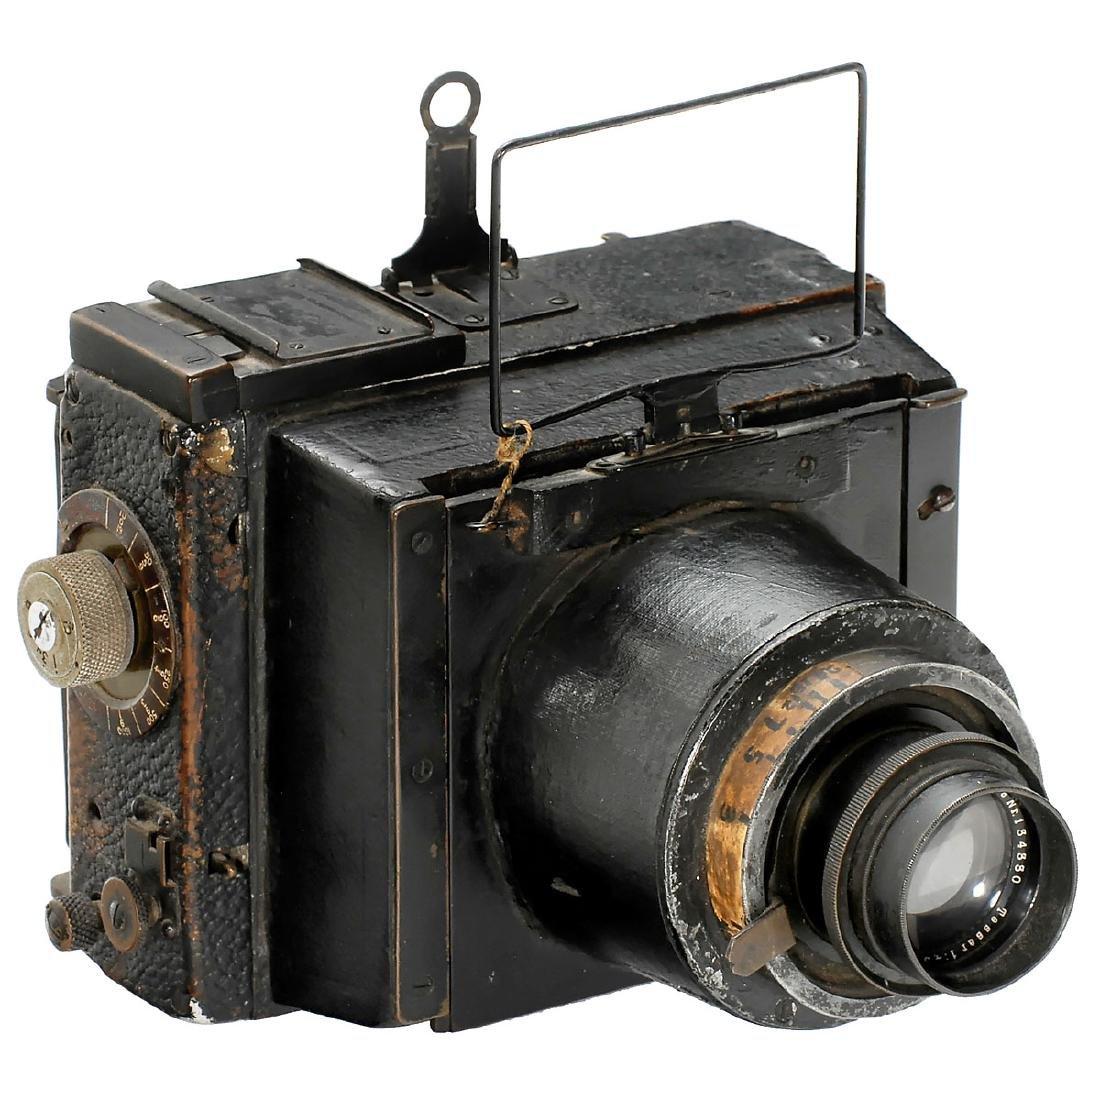 Aircraft Camera (9 x 12 cm), c. 1910–20